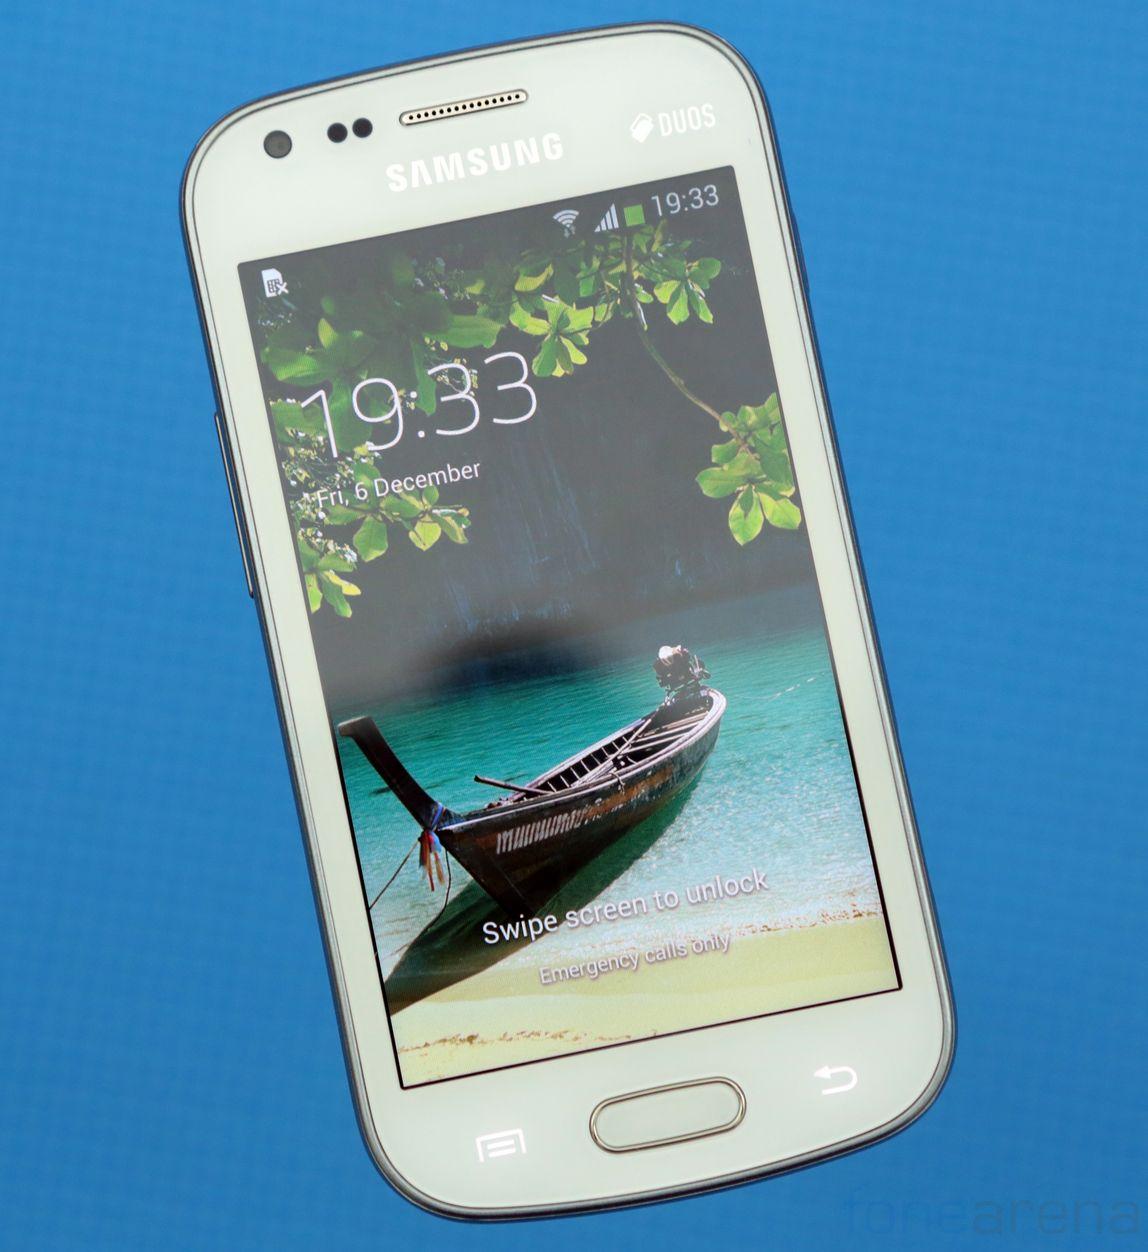 Samsung Galaxy S Duos 2 Photo Gallery 20